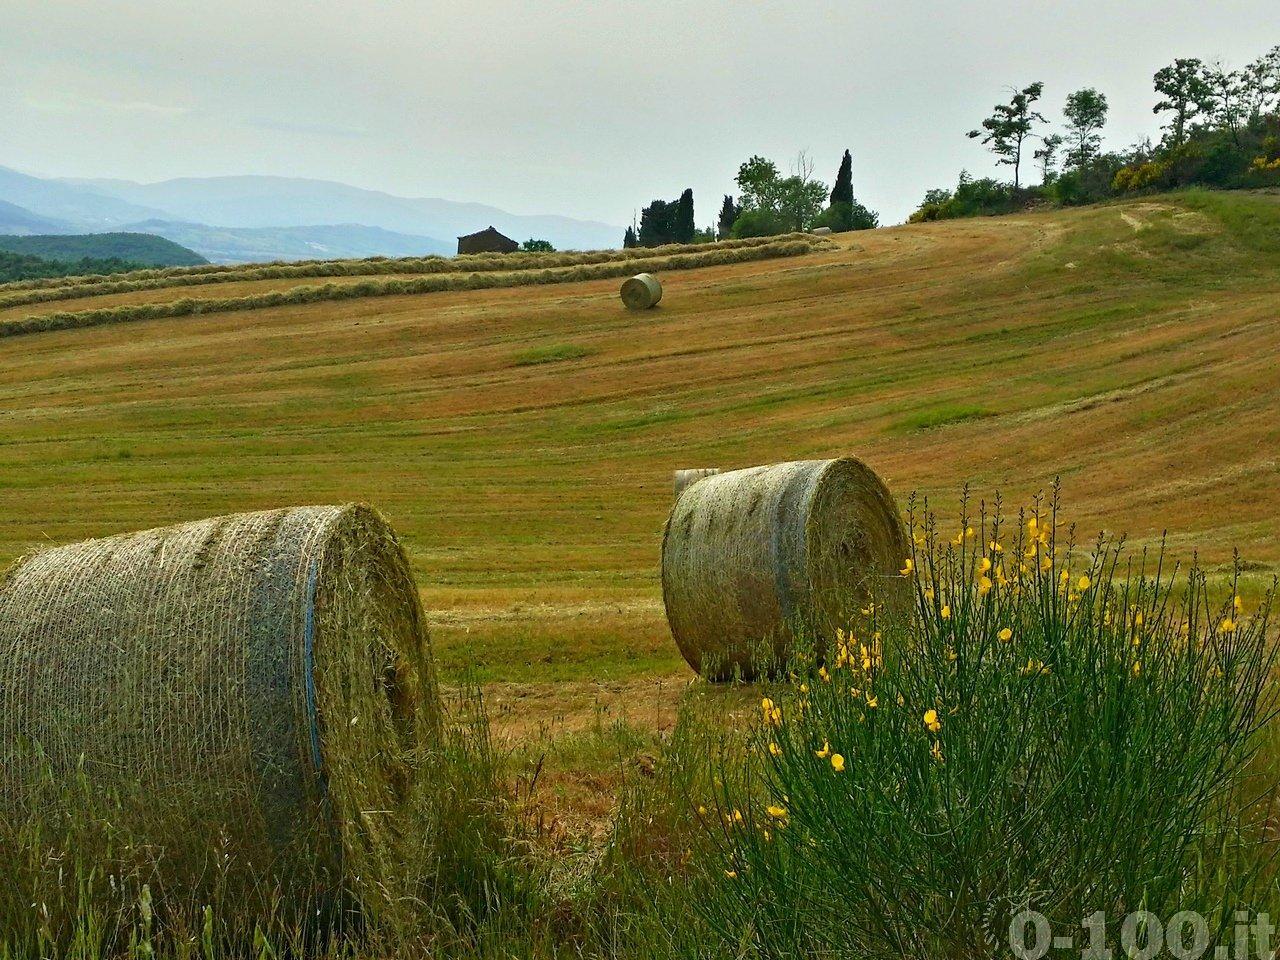 santa-felicita-paterna-turismo-umbria-agriturismo-vacanza-country-house-0-100__39